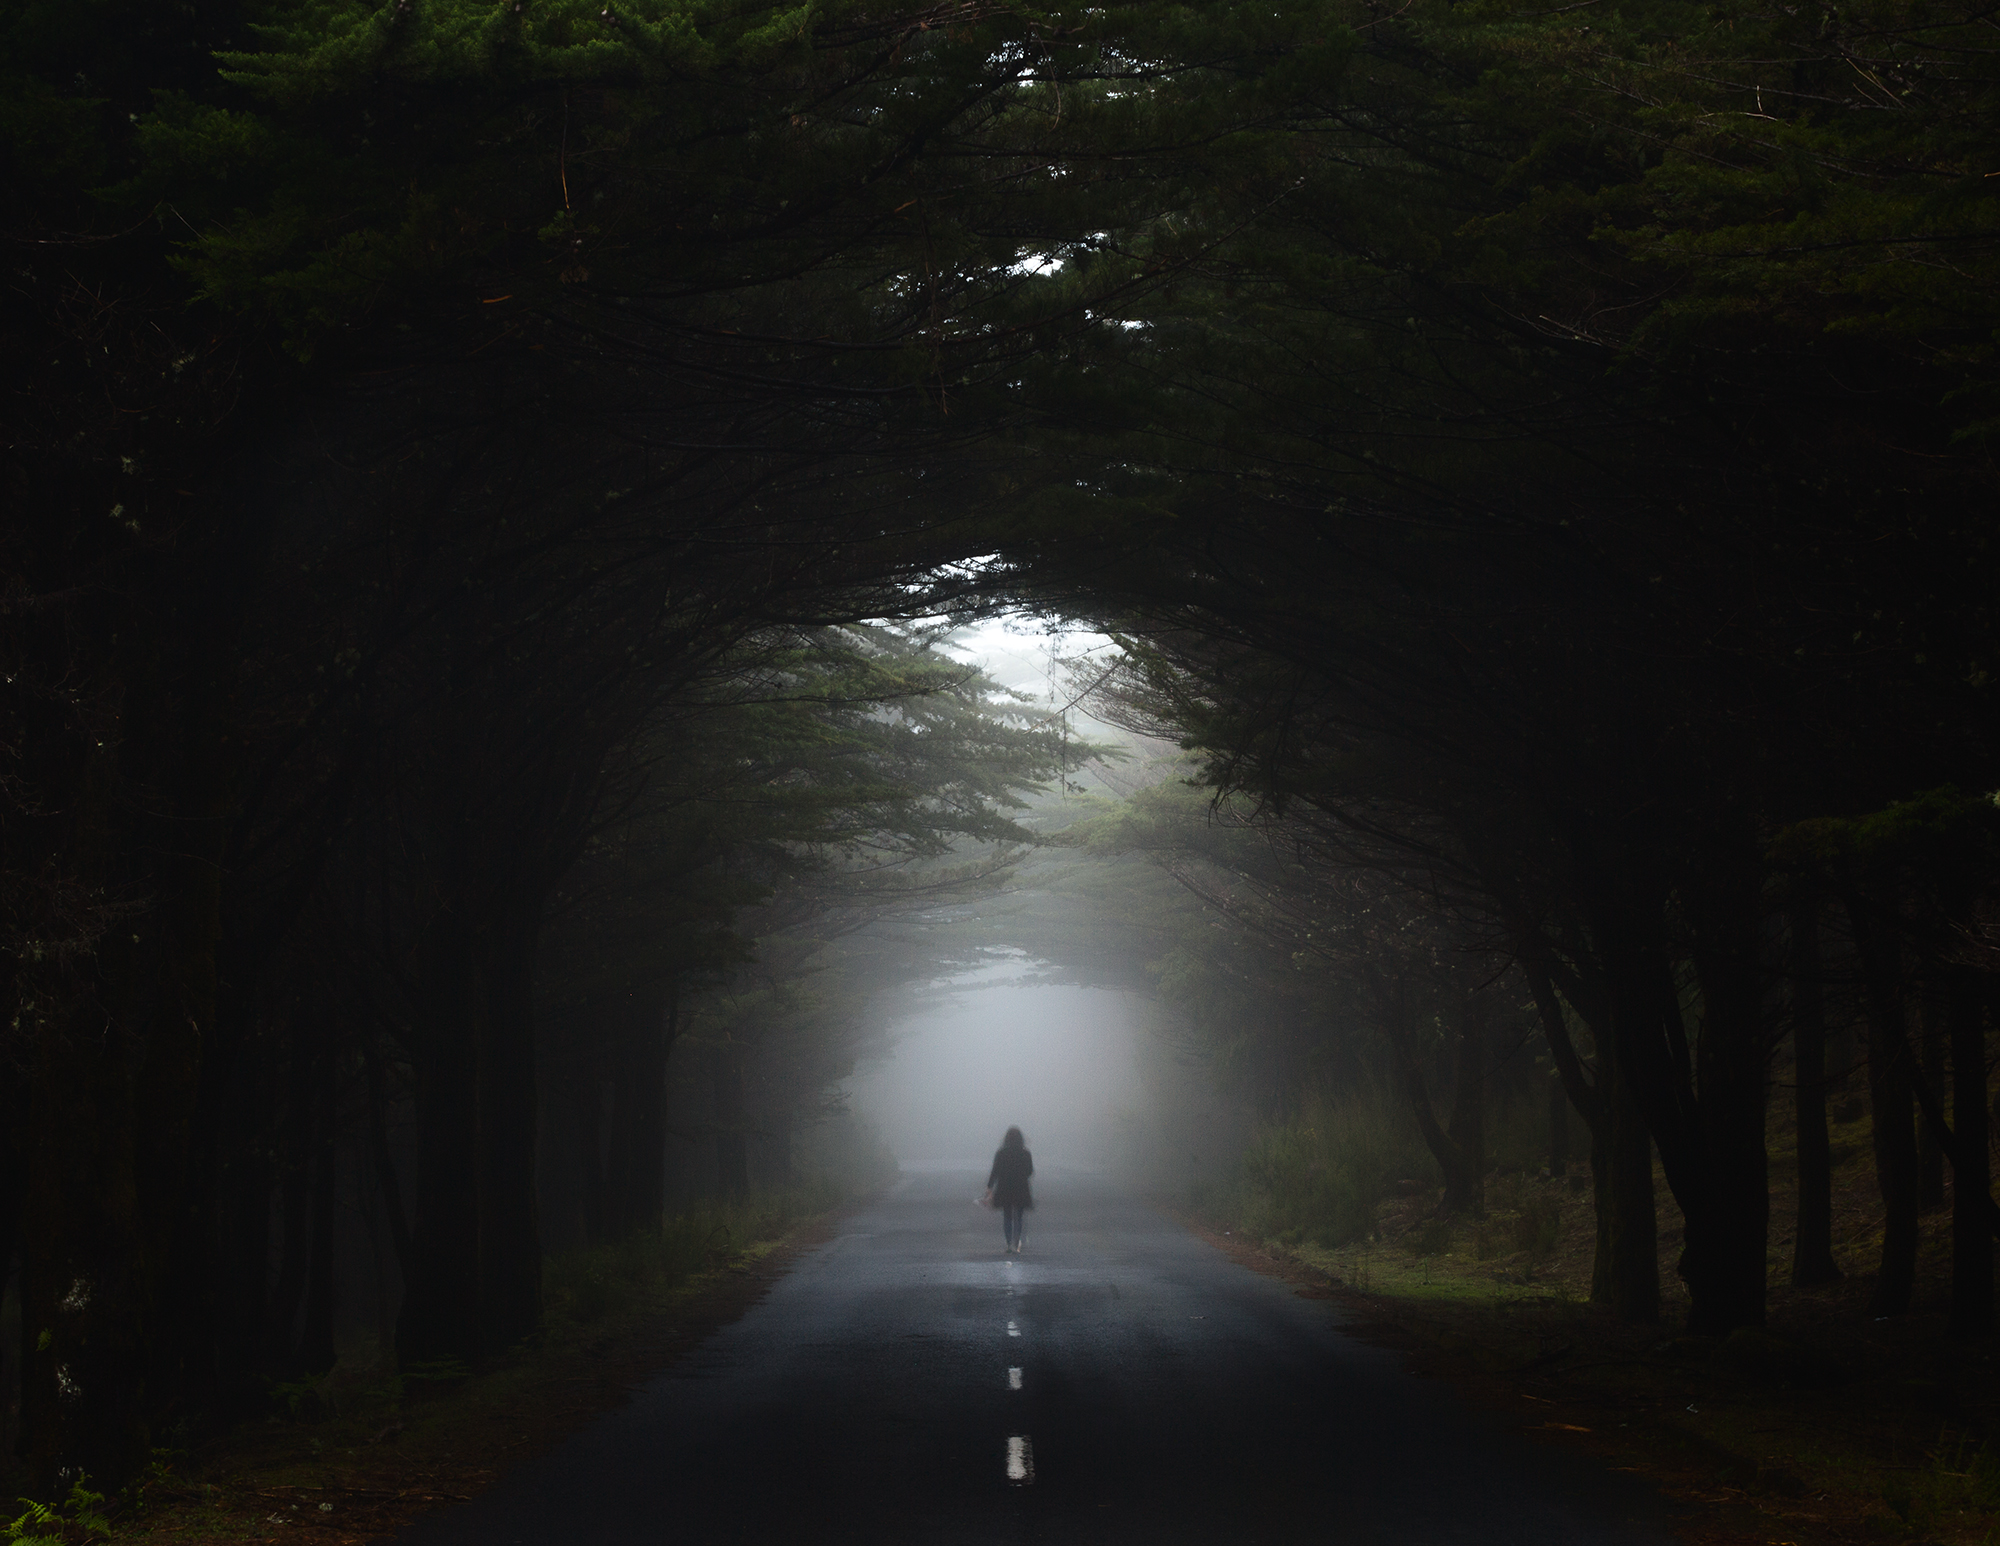 the_paths_we_take_nunoserrao.jpg